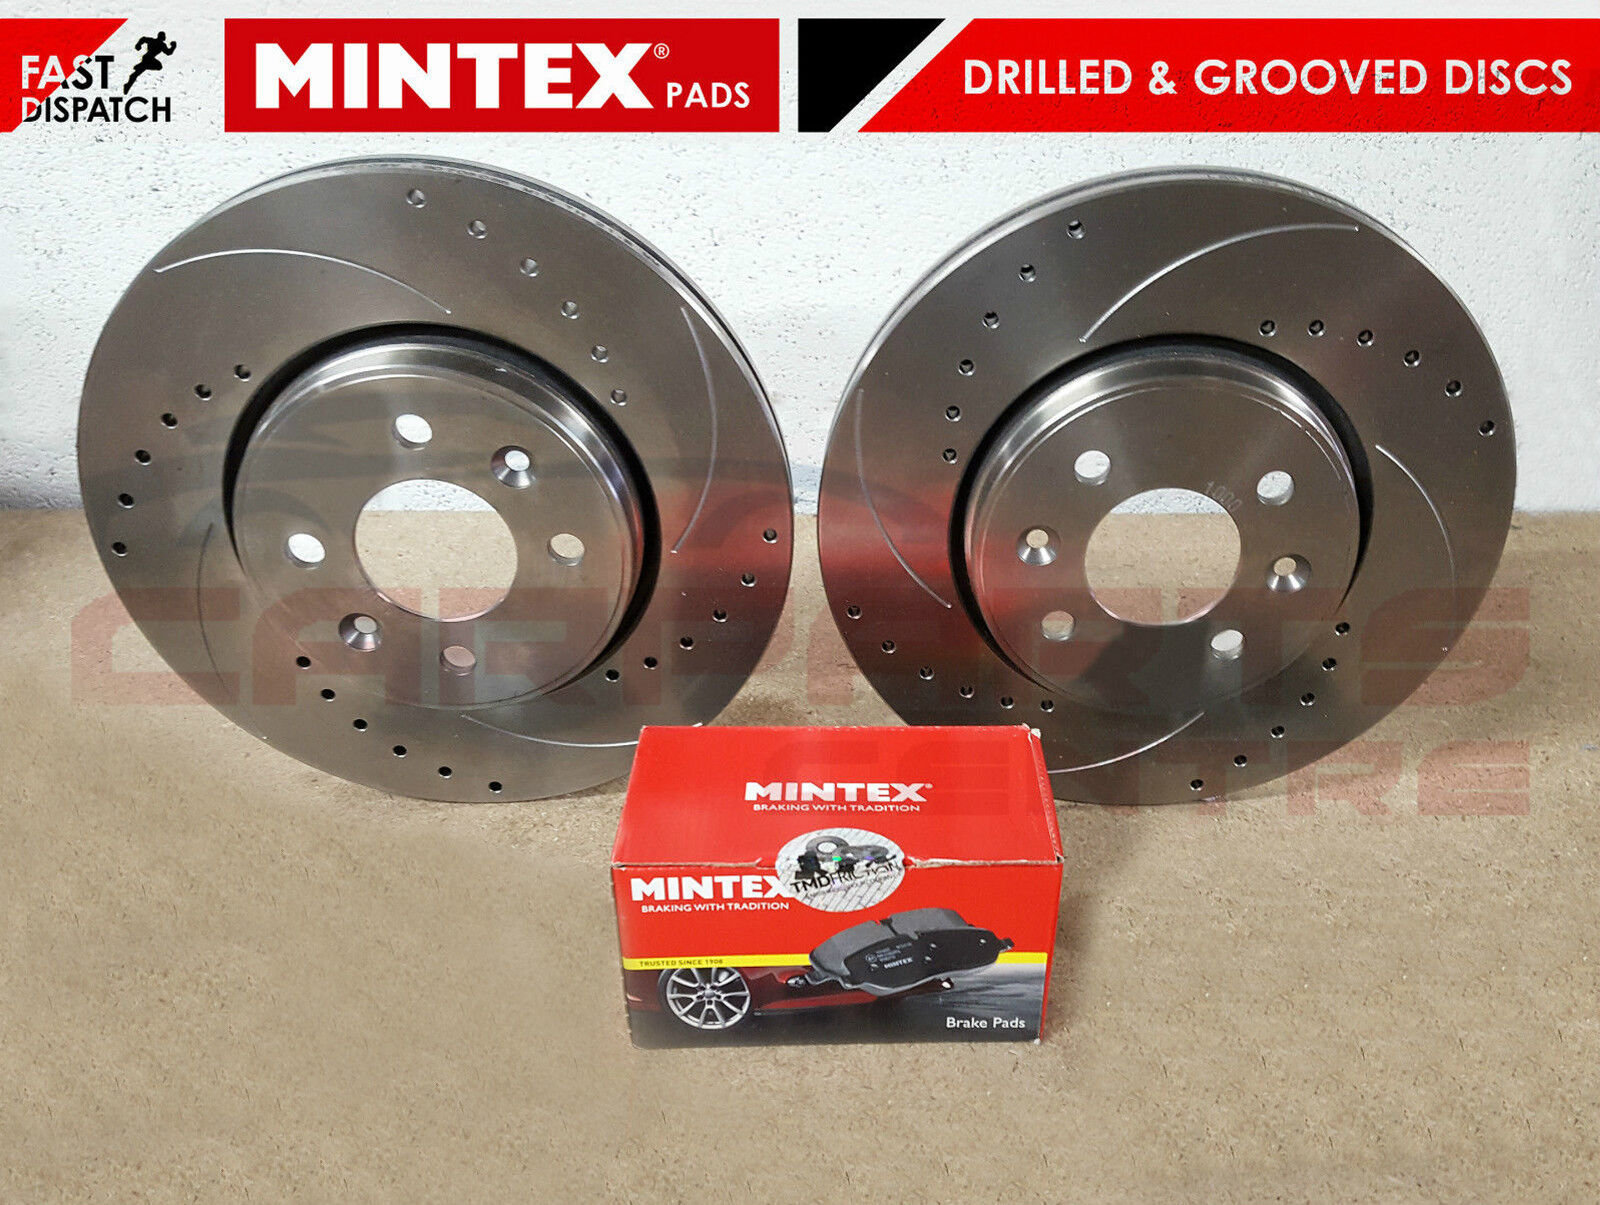 FOR FORD TRANSIT CUSTOM 2.2 2012-/> MINTEX FRONT BRAKE DISCS SET DISC PADS KIT